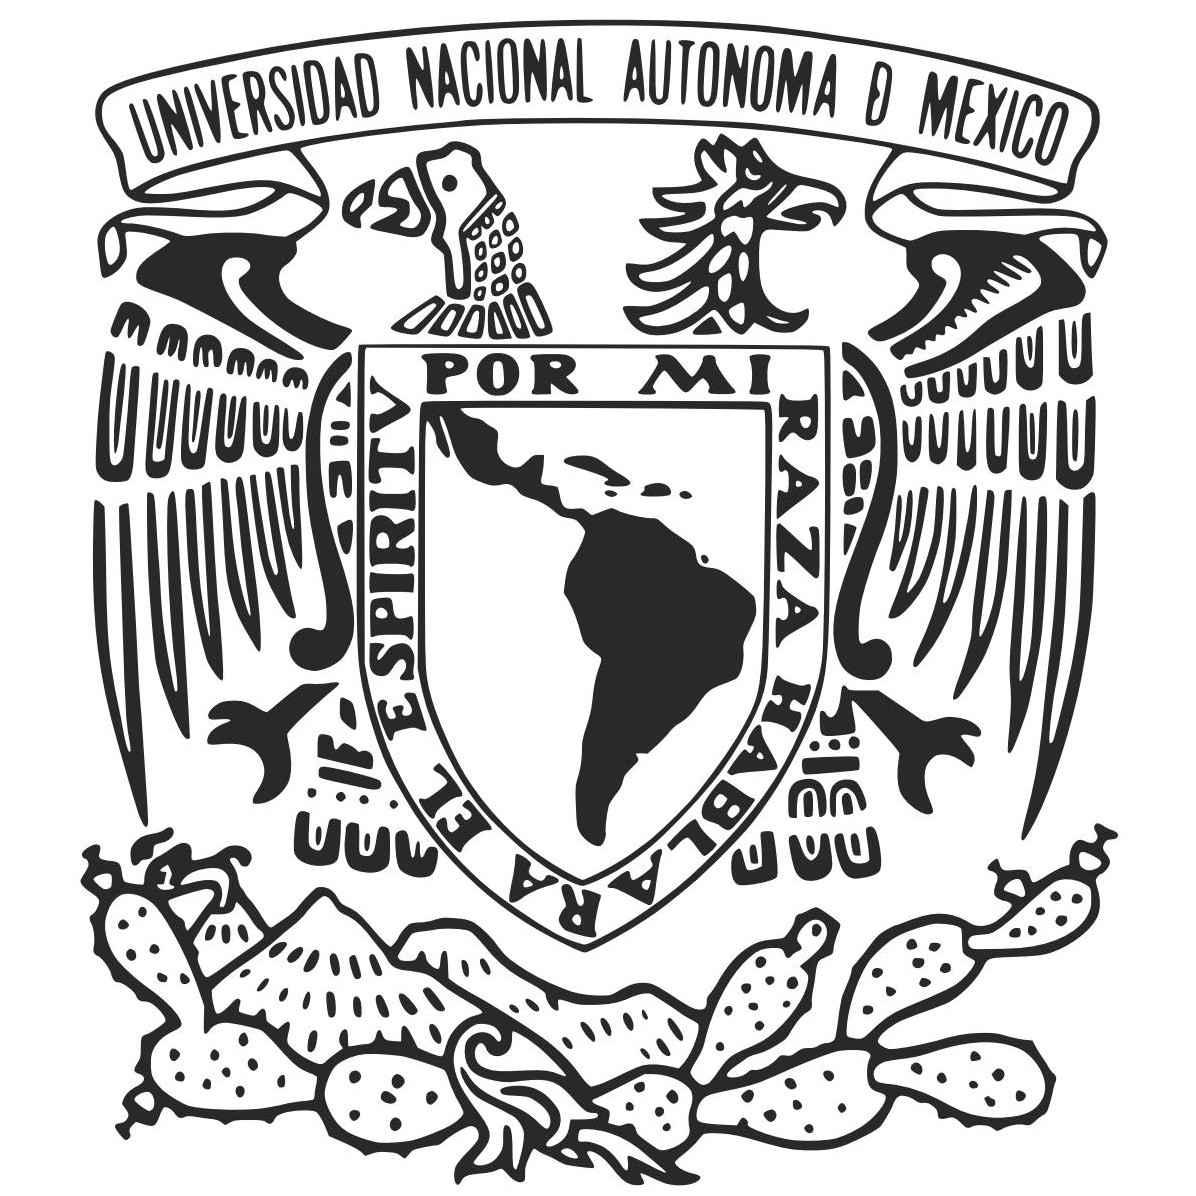 UNAM_Universidad_Nacional_Autonoma_de_Mexico_Logo